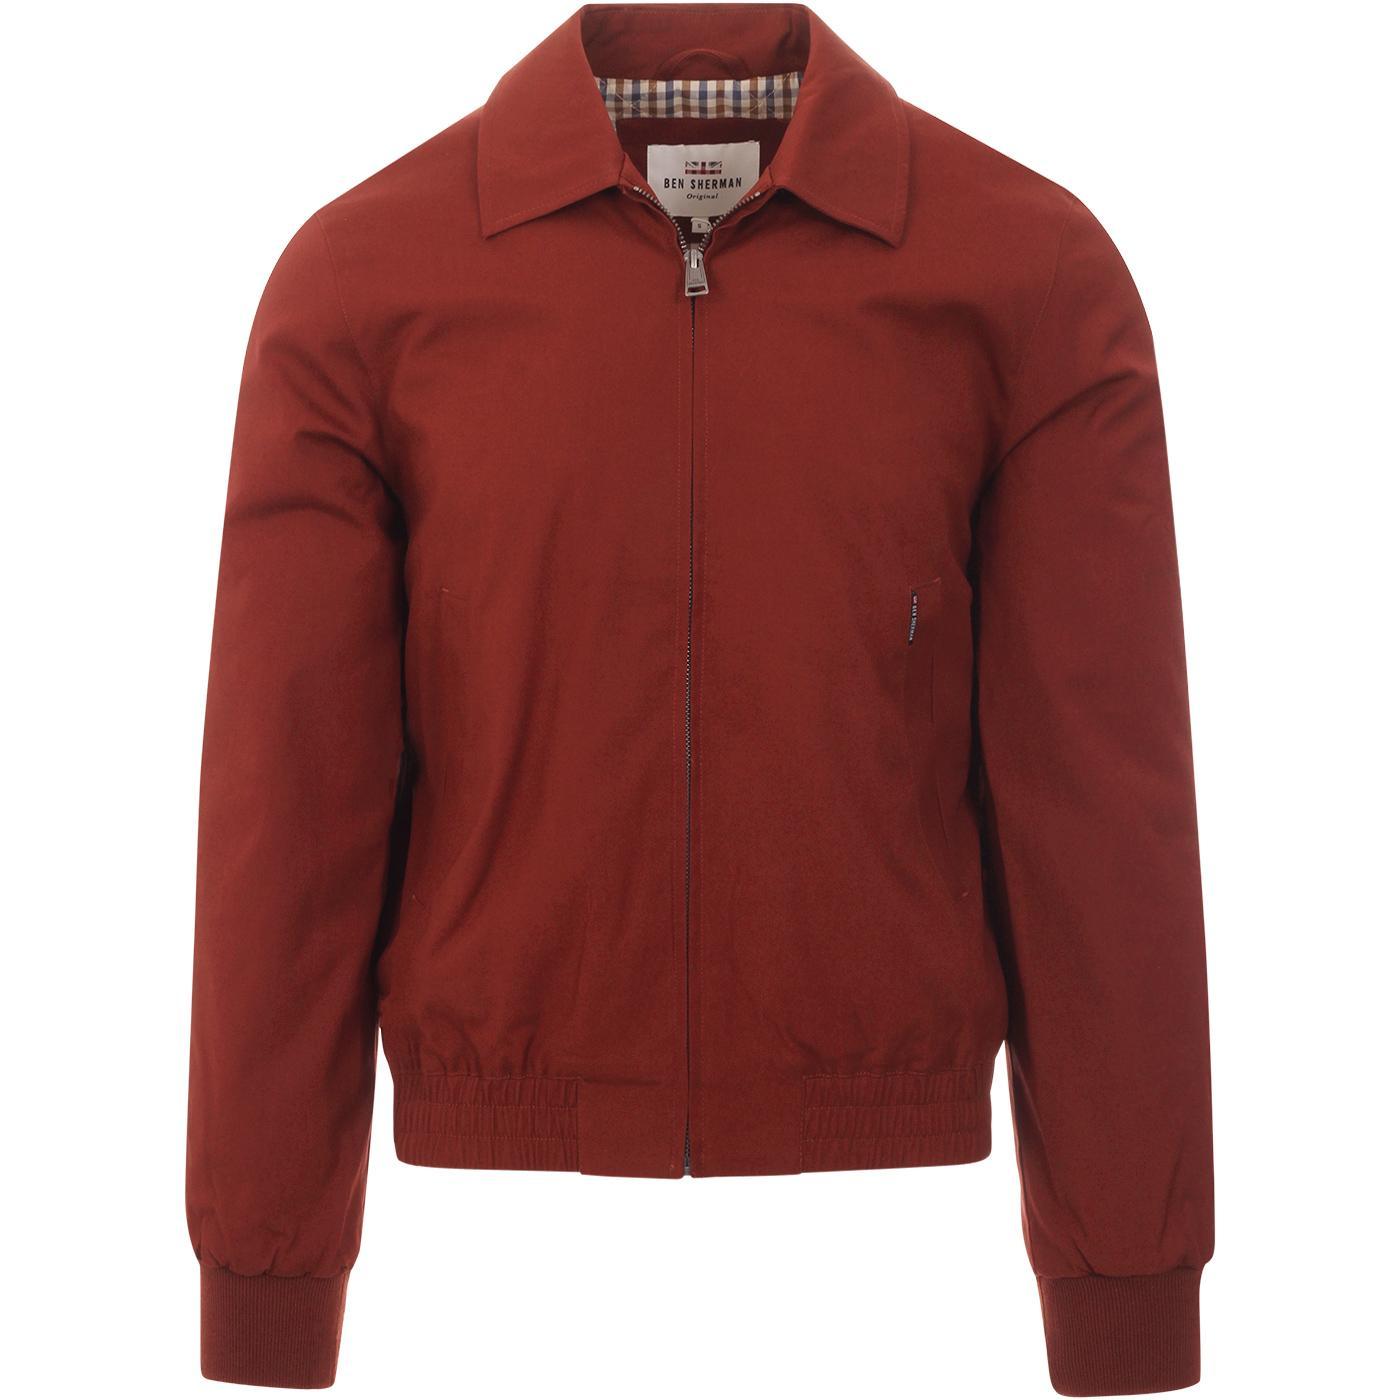 BEN SHERMAN Men's Retro Quilted Harrington Jacket